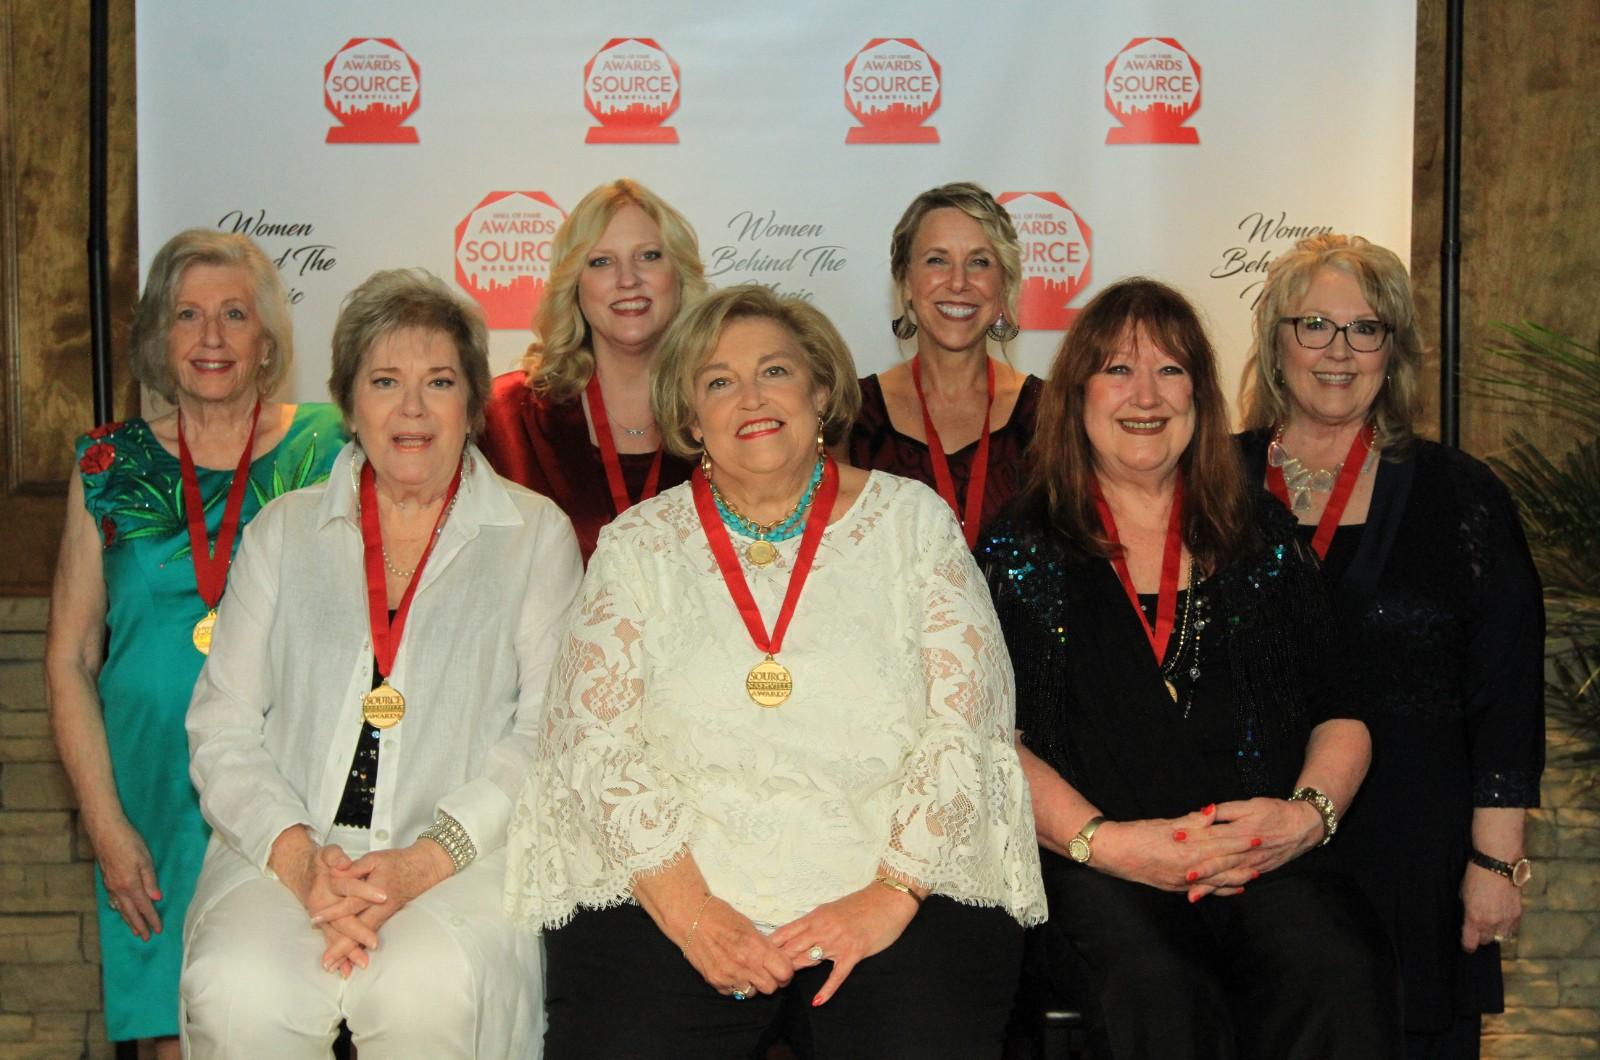 Front row (seated): Gayle Hill, Judi Turner, Trisha Walker-Cunningham. Back row: Grace Reinbold, Beverly Keel, Erika Wollam-Nichols, Sarah Brosmer at the 2019 Source Hall of Fame Awards